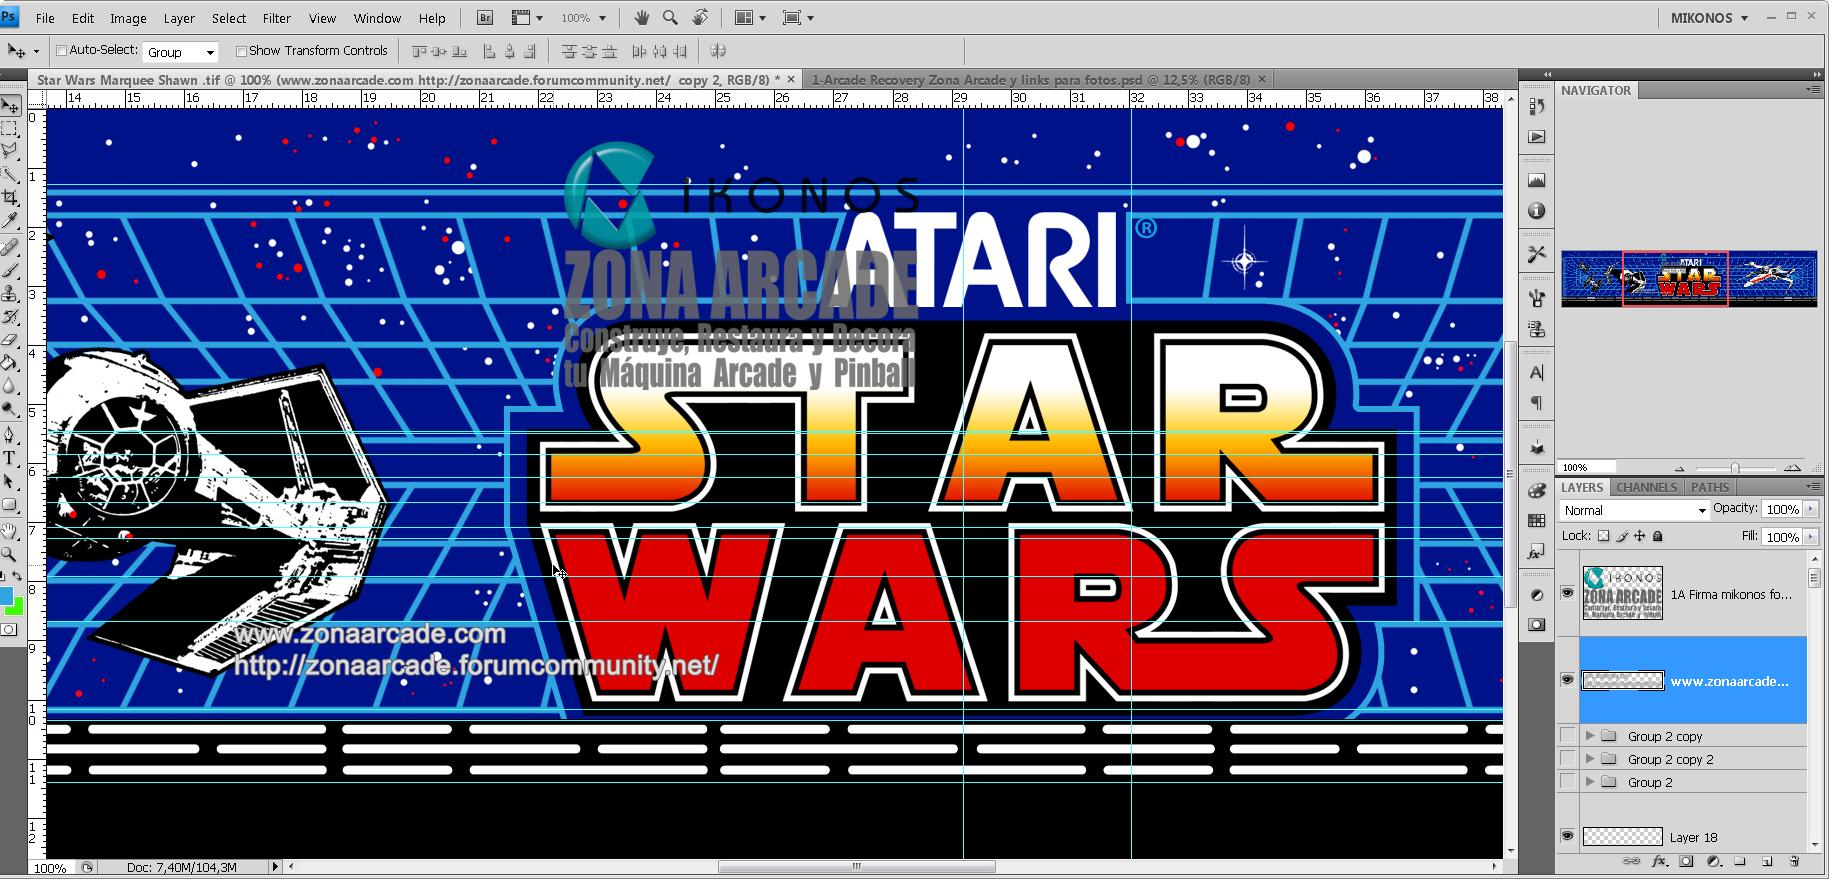 Atari Star Wars Artwork Project For Shawn S Arcade Bartop # Venpermuto Muebles